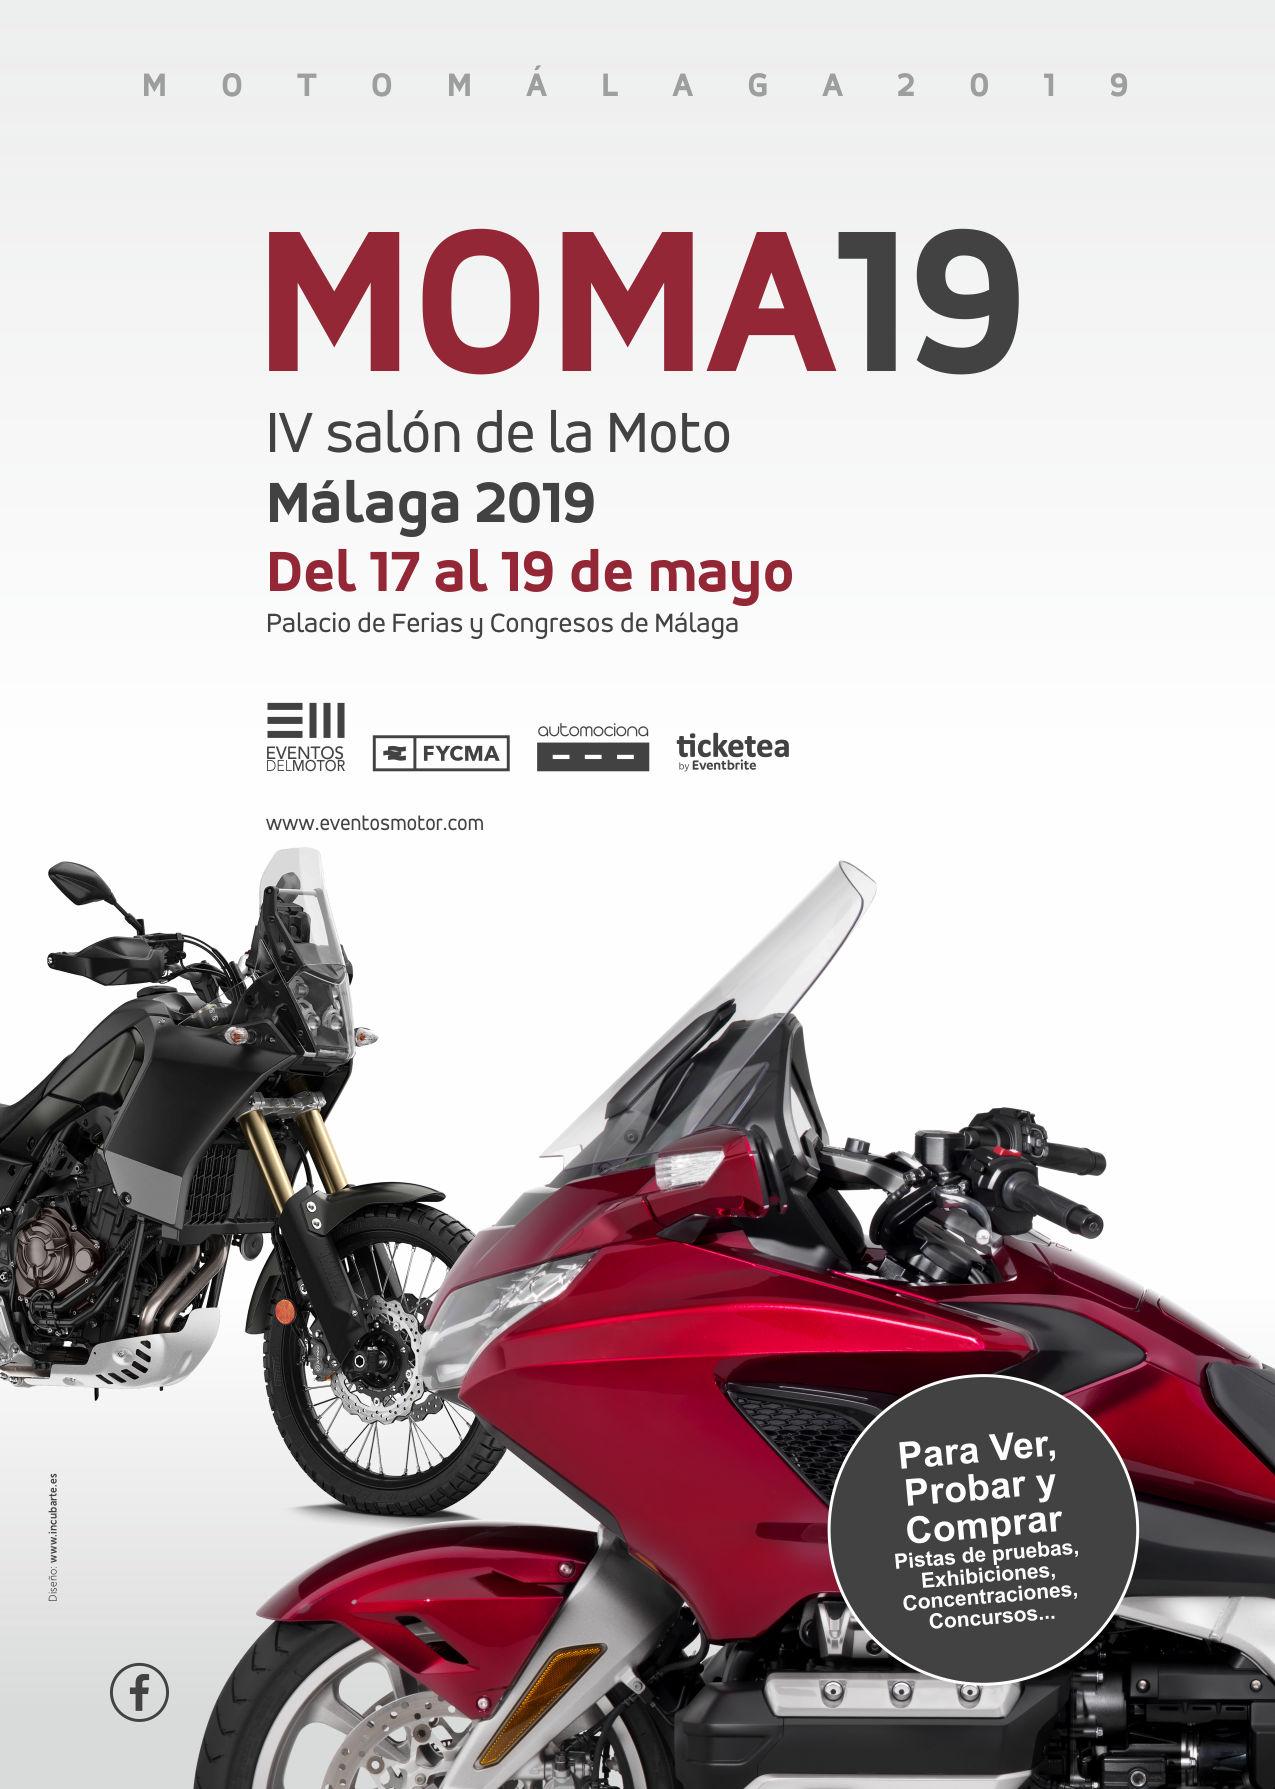 MOMA 2019 – IV Salón de la Moto de Málaga